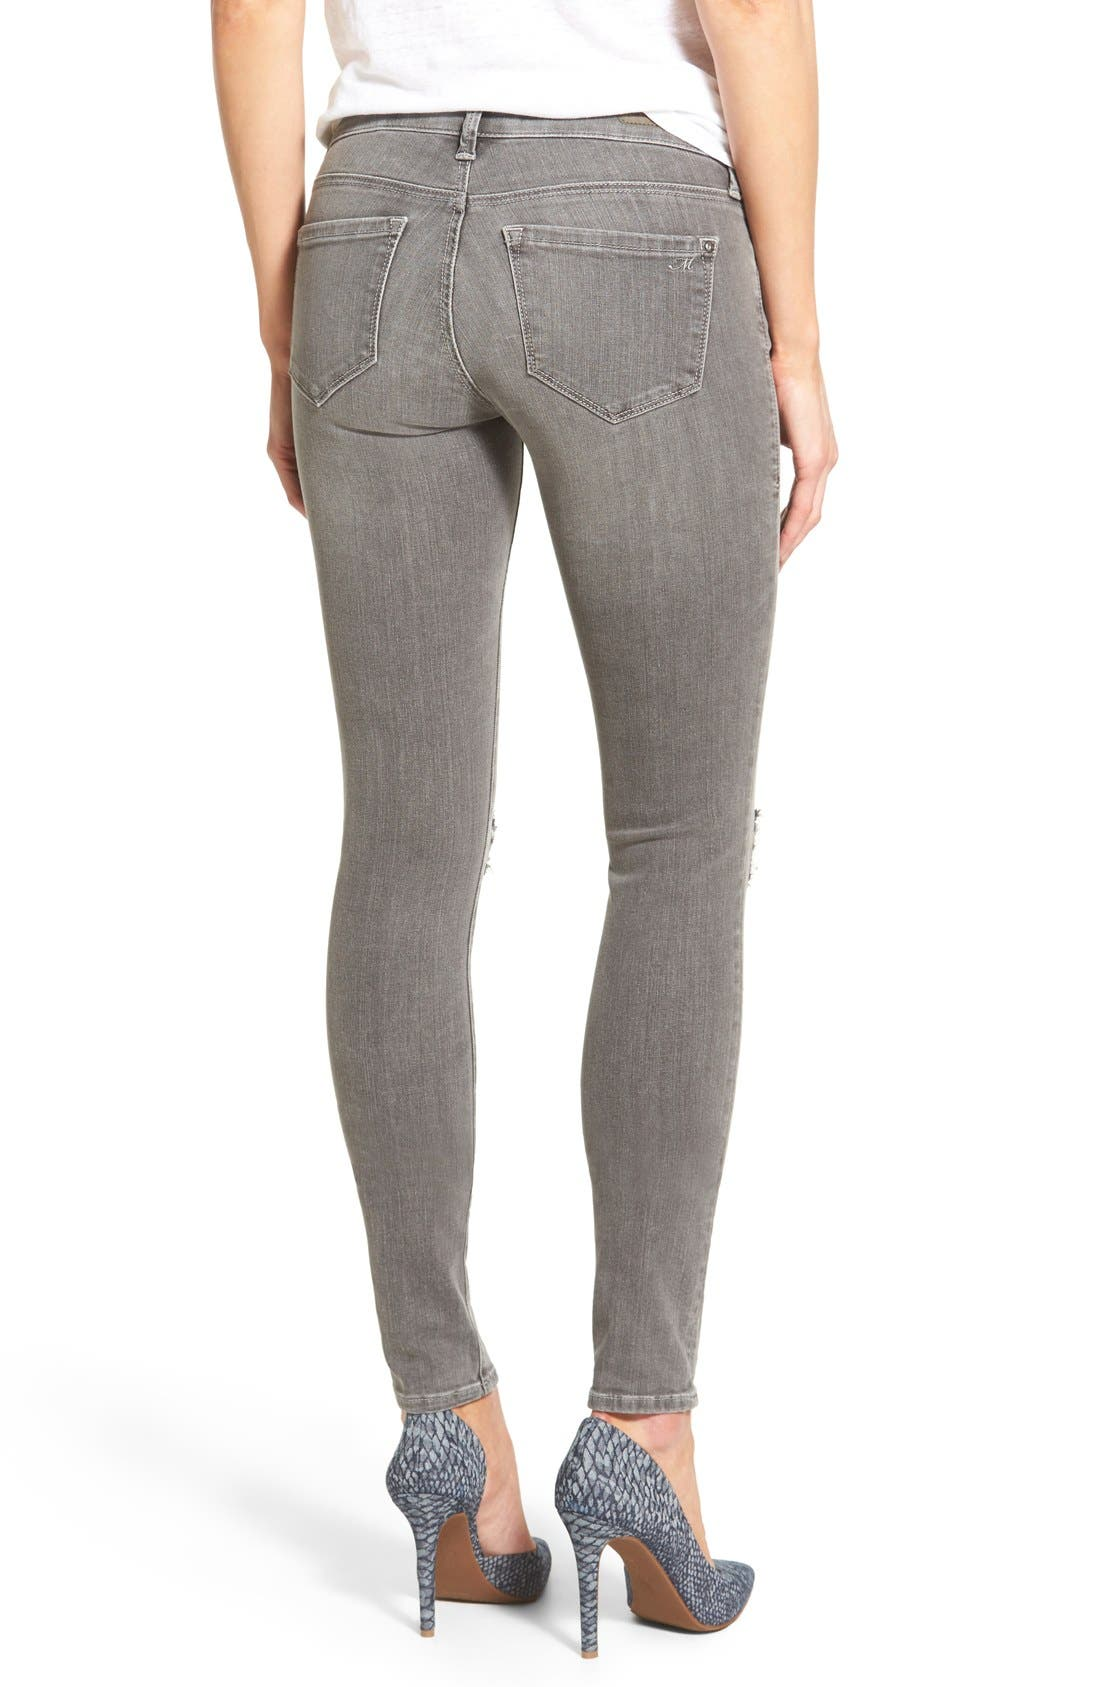 Alternate Image 2  - Mavi Jeans 'Serena' Distressed Stretch Skinny Jeans (Grey Ripped)